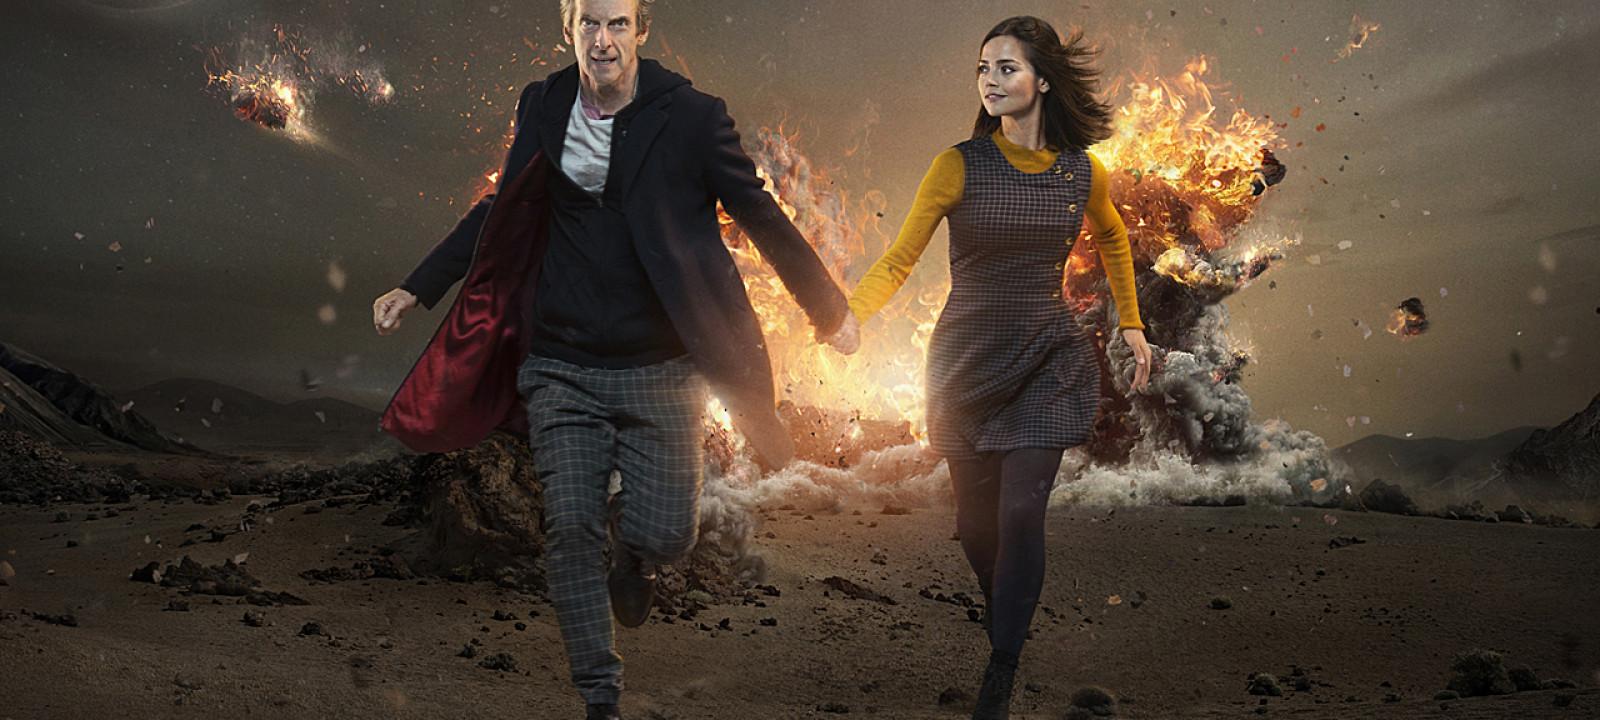 Doctor Who Season 9 image